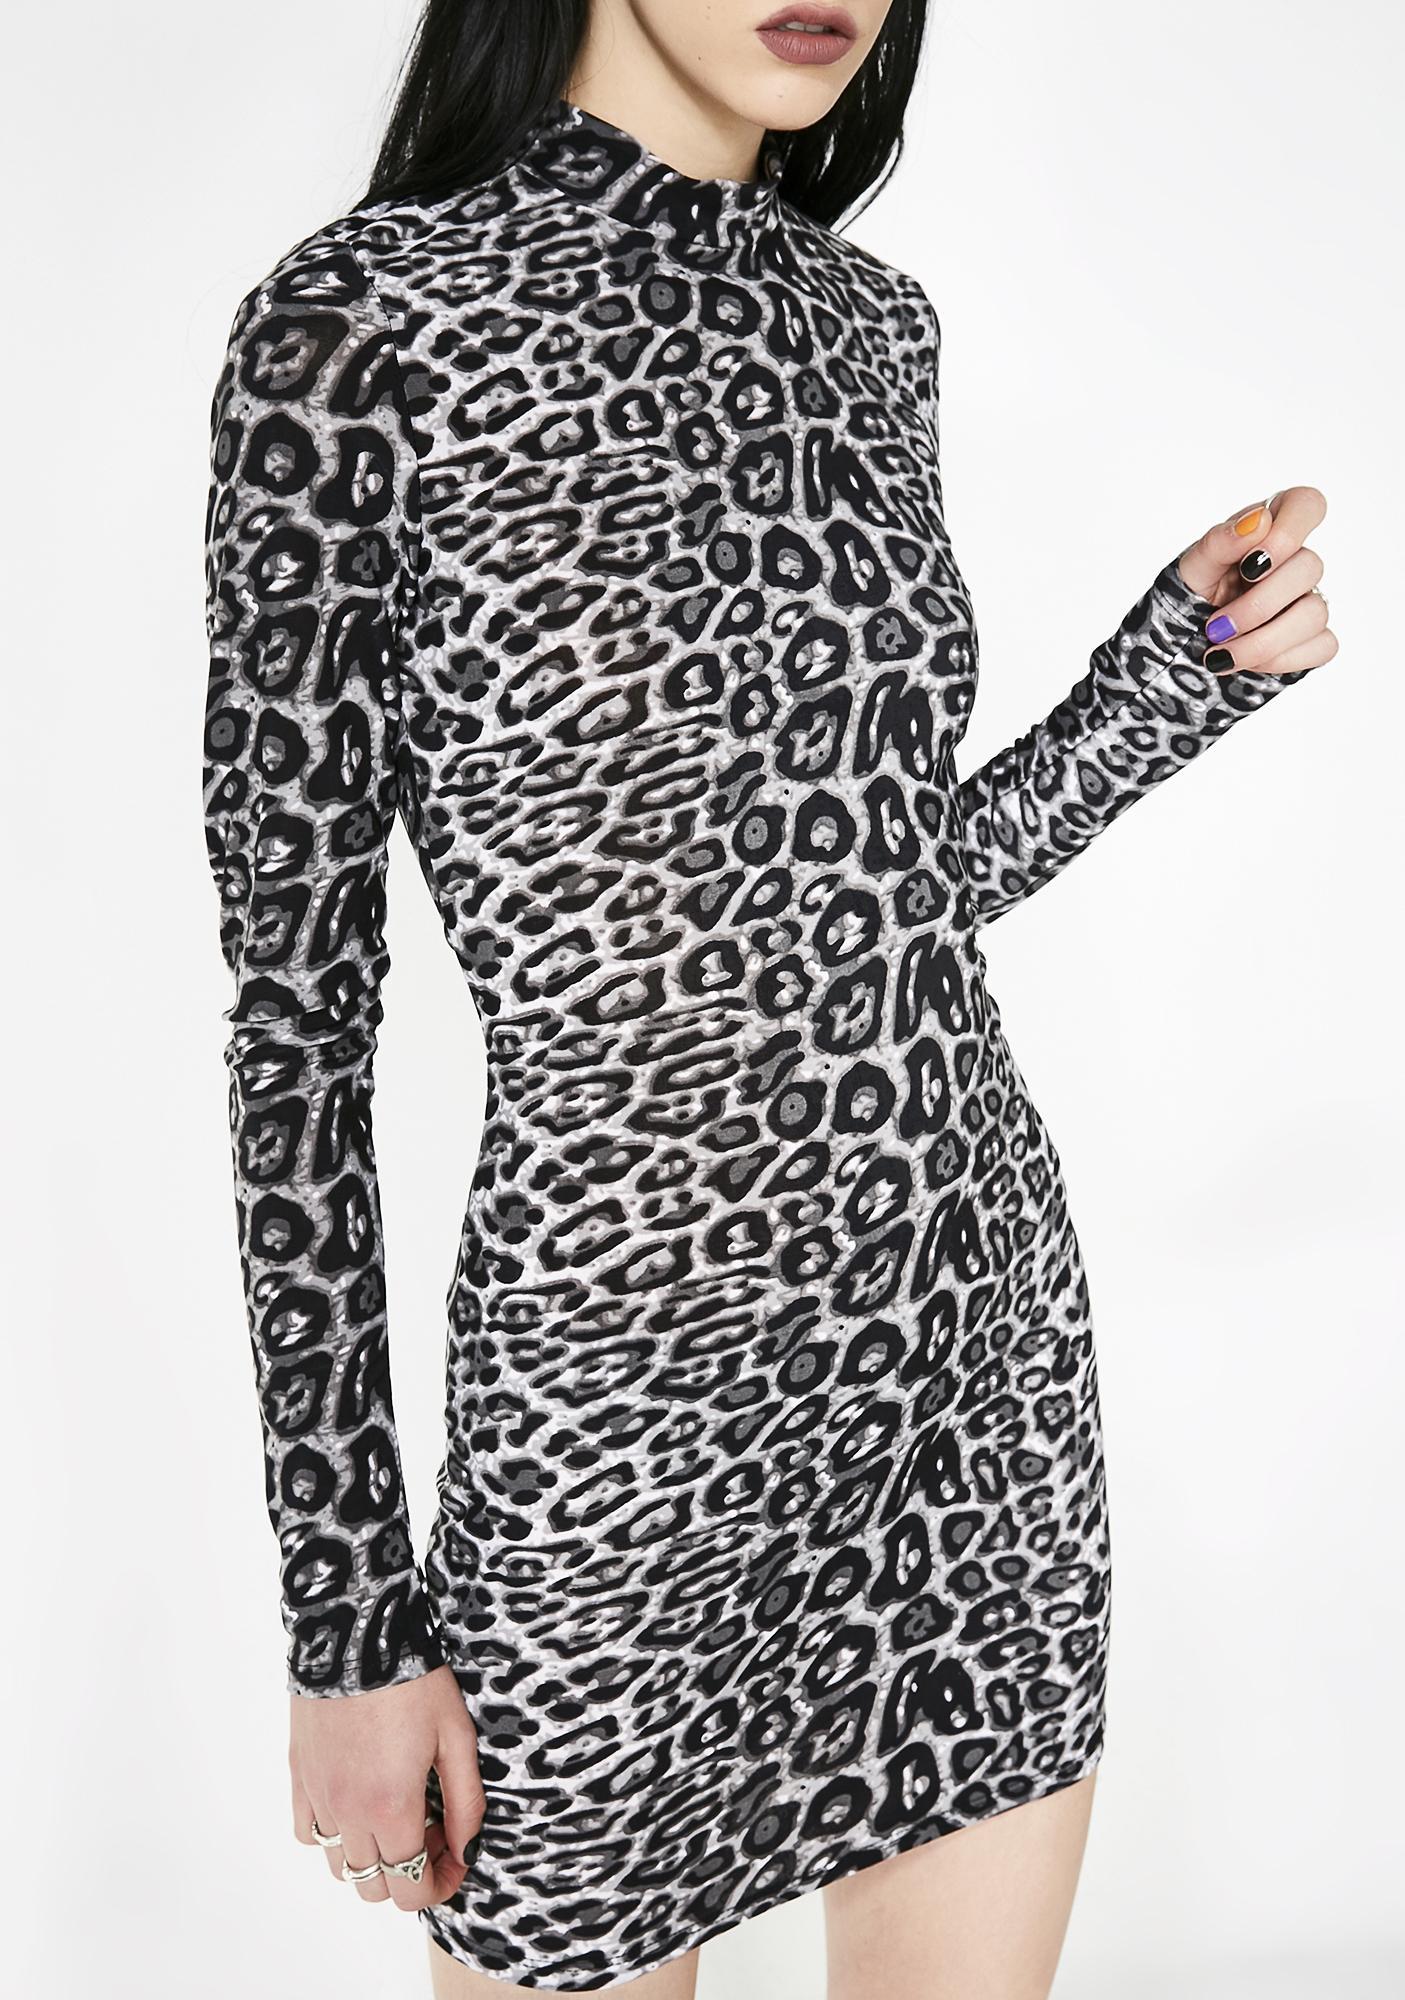 Undomesticated Bodycon Dress